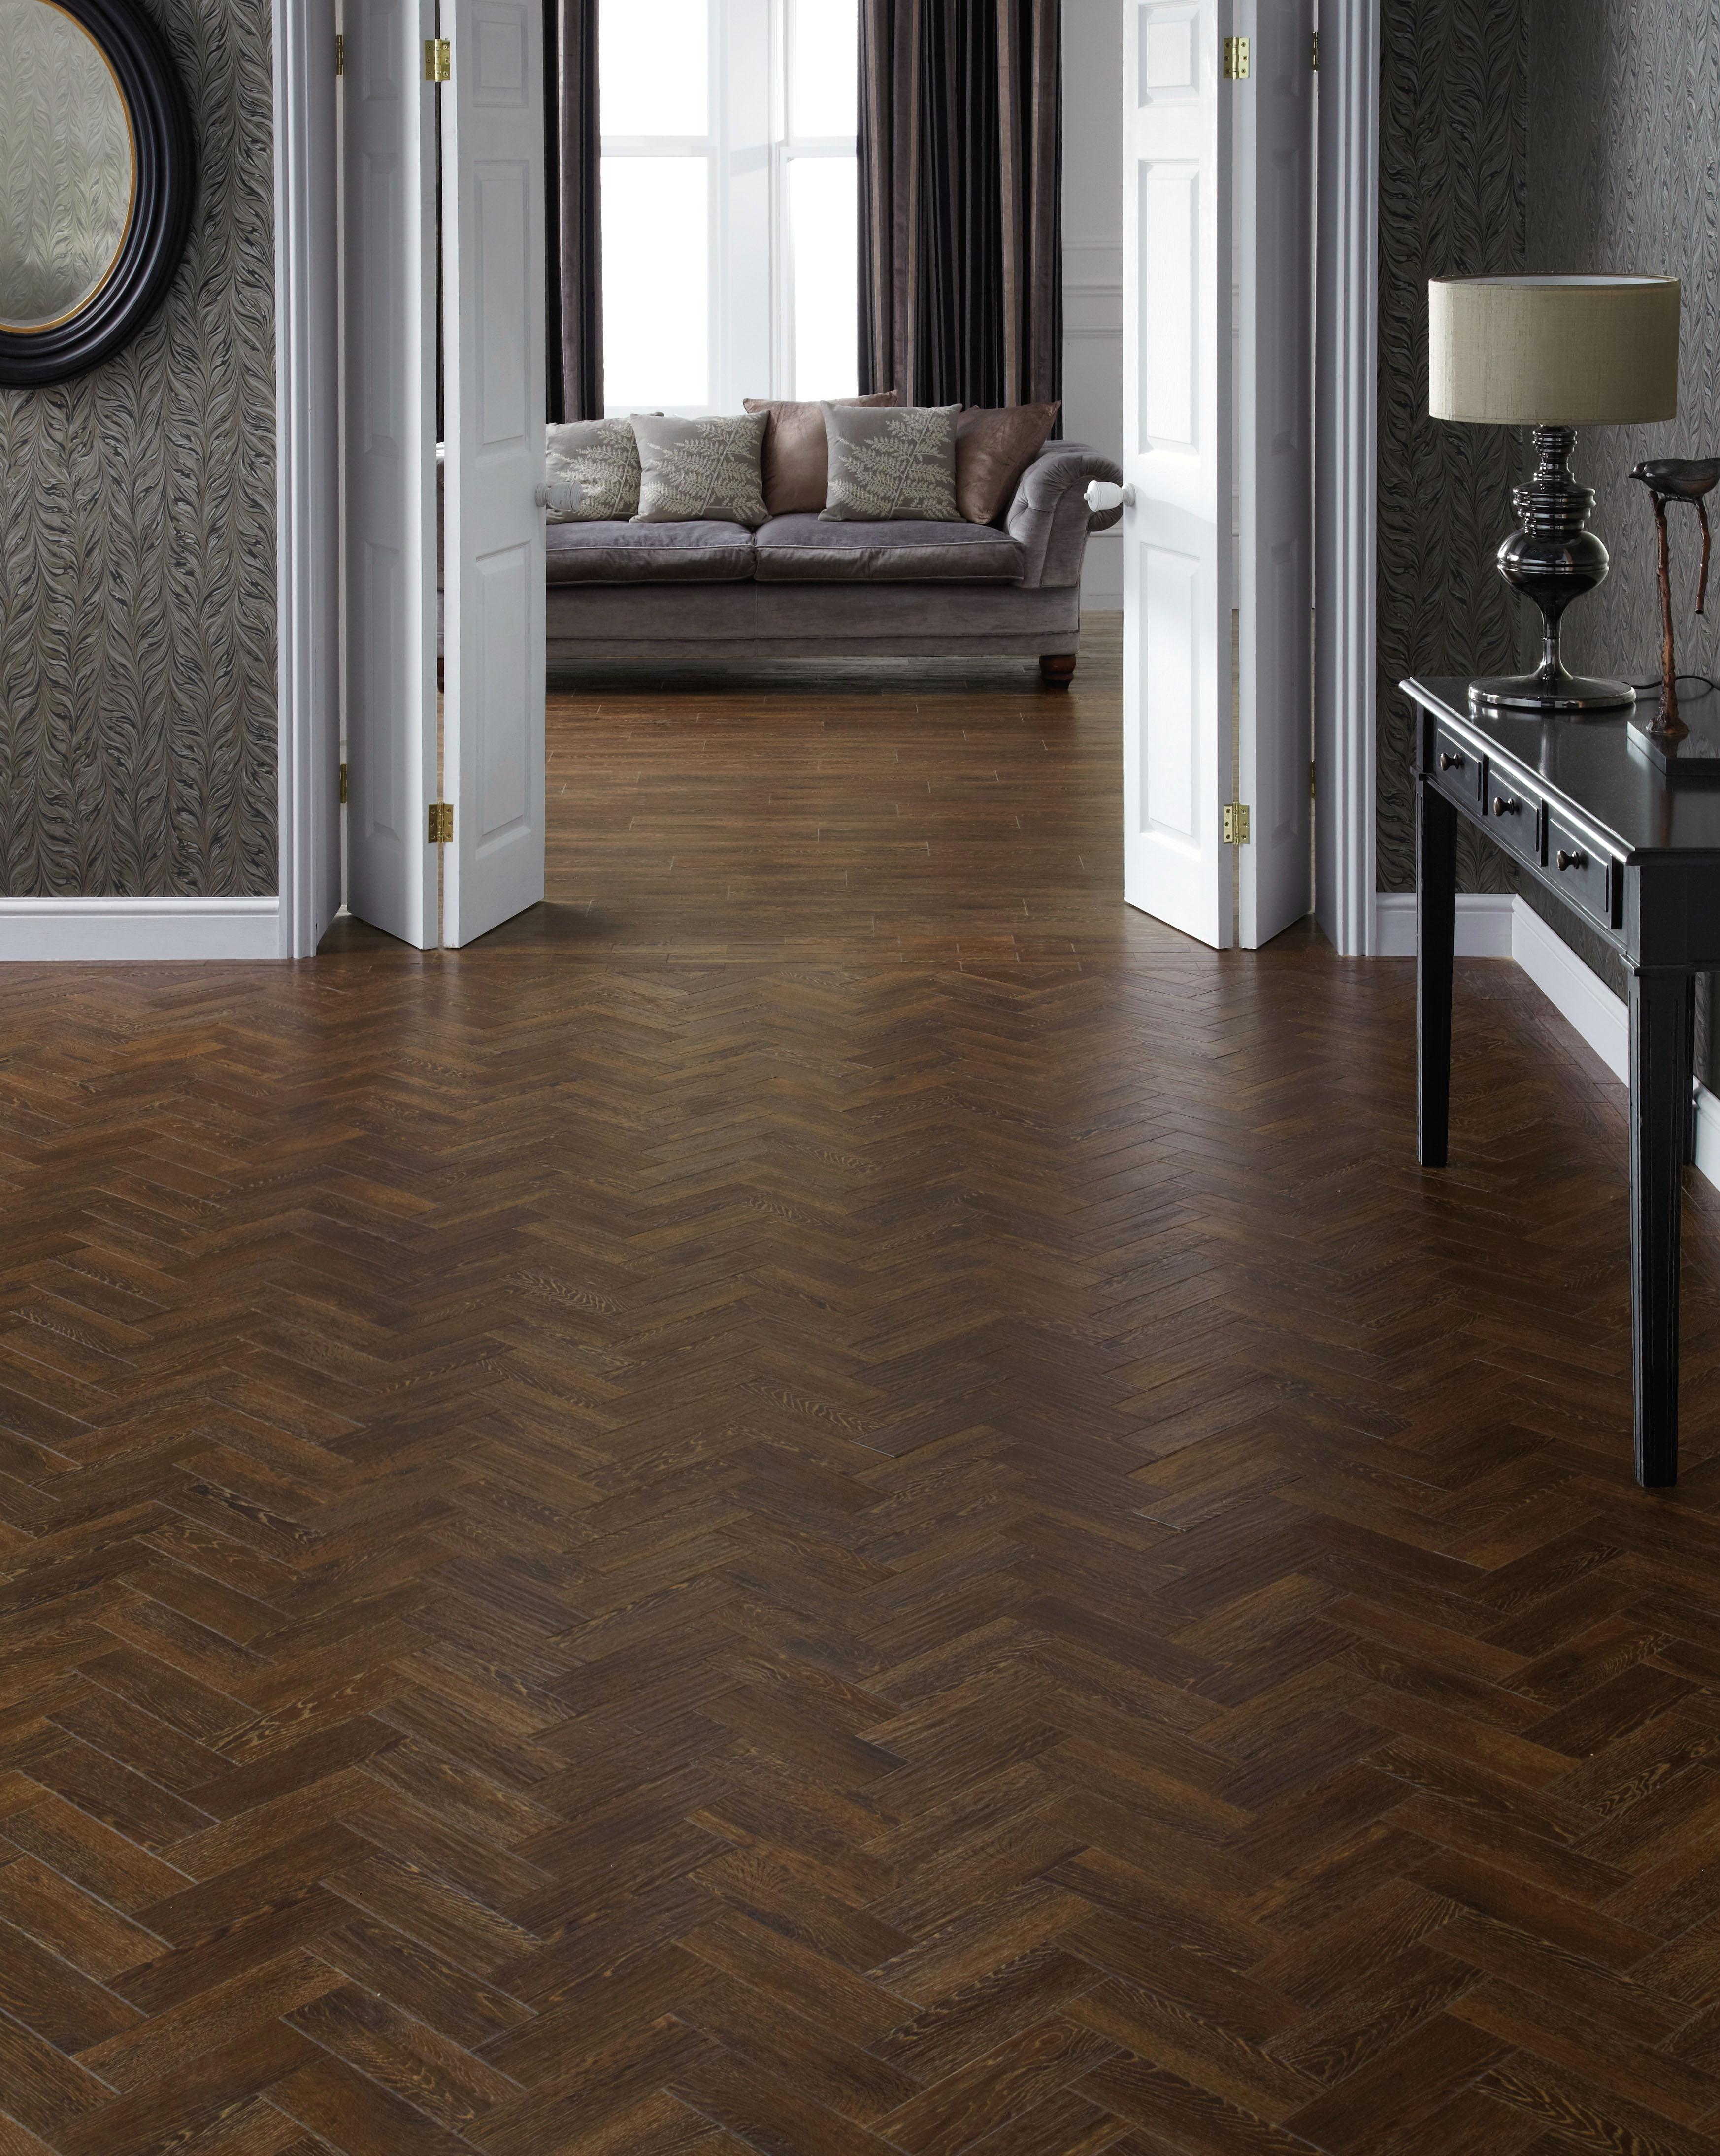 tile in lvt on derby russet karndean trent oak vinyl burton floor installation click flooring laminate